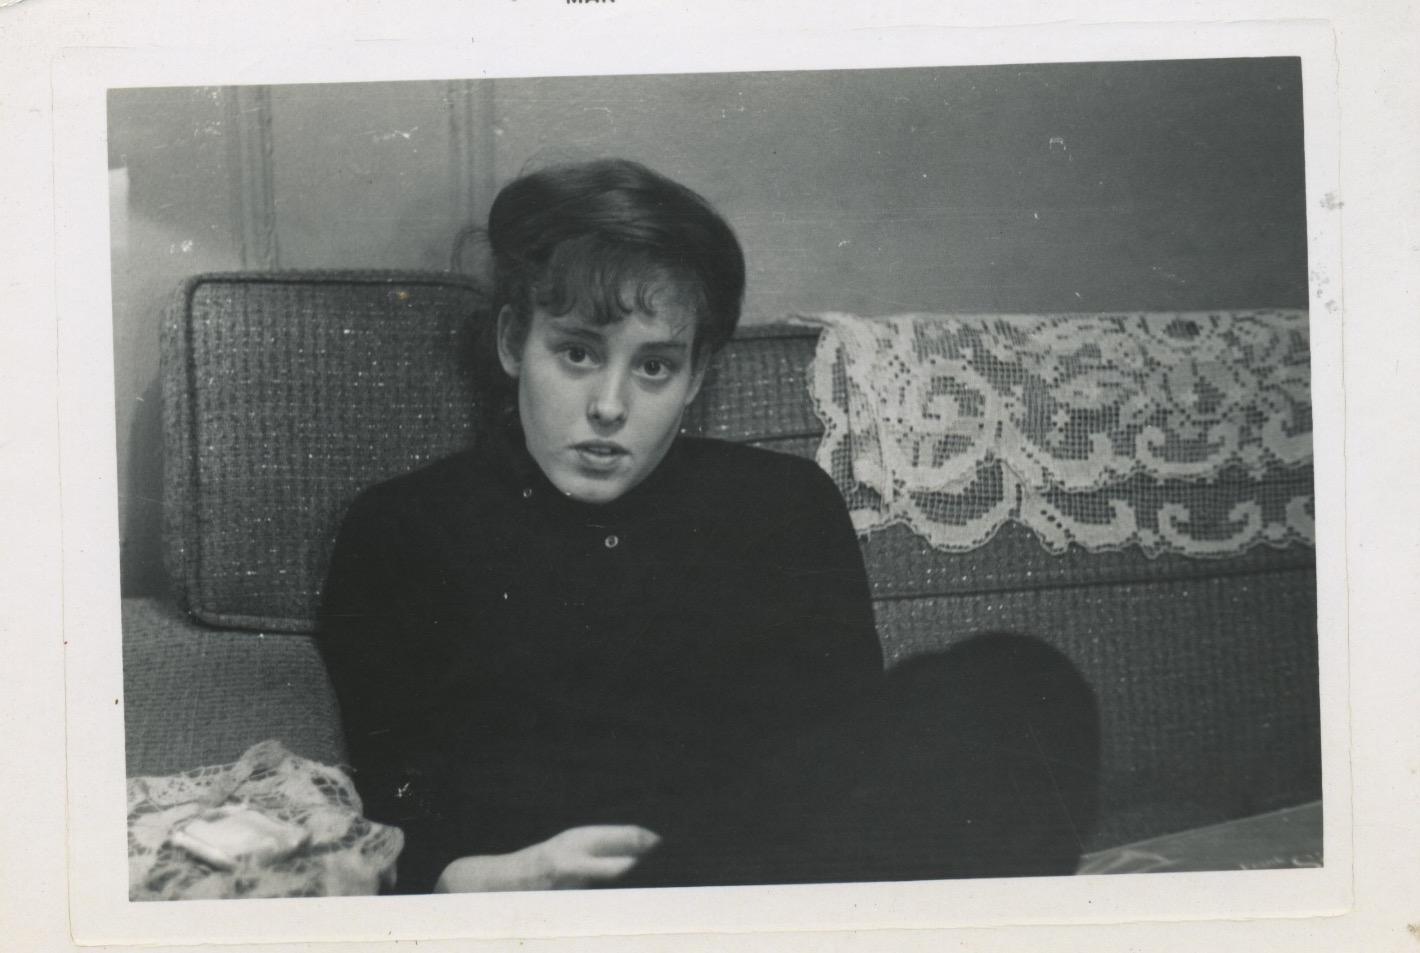 Lee in 1961. Image courtesy of Lee Zevy.